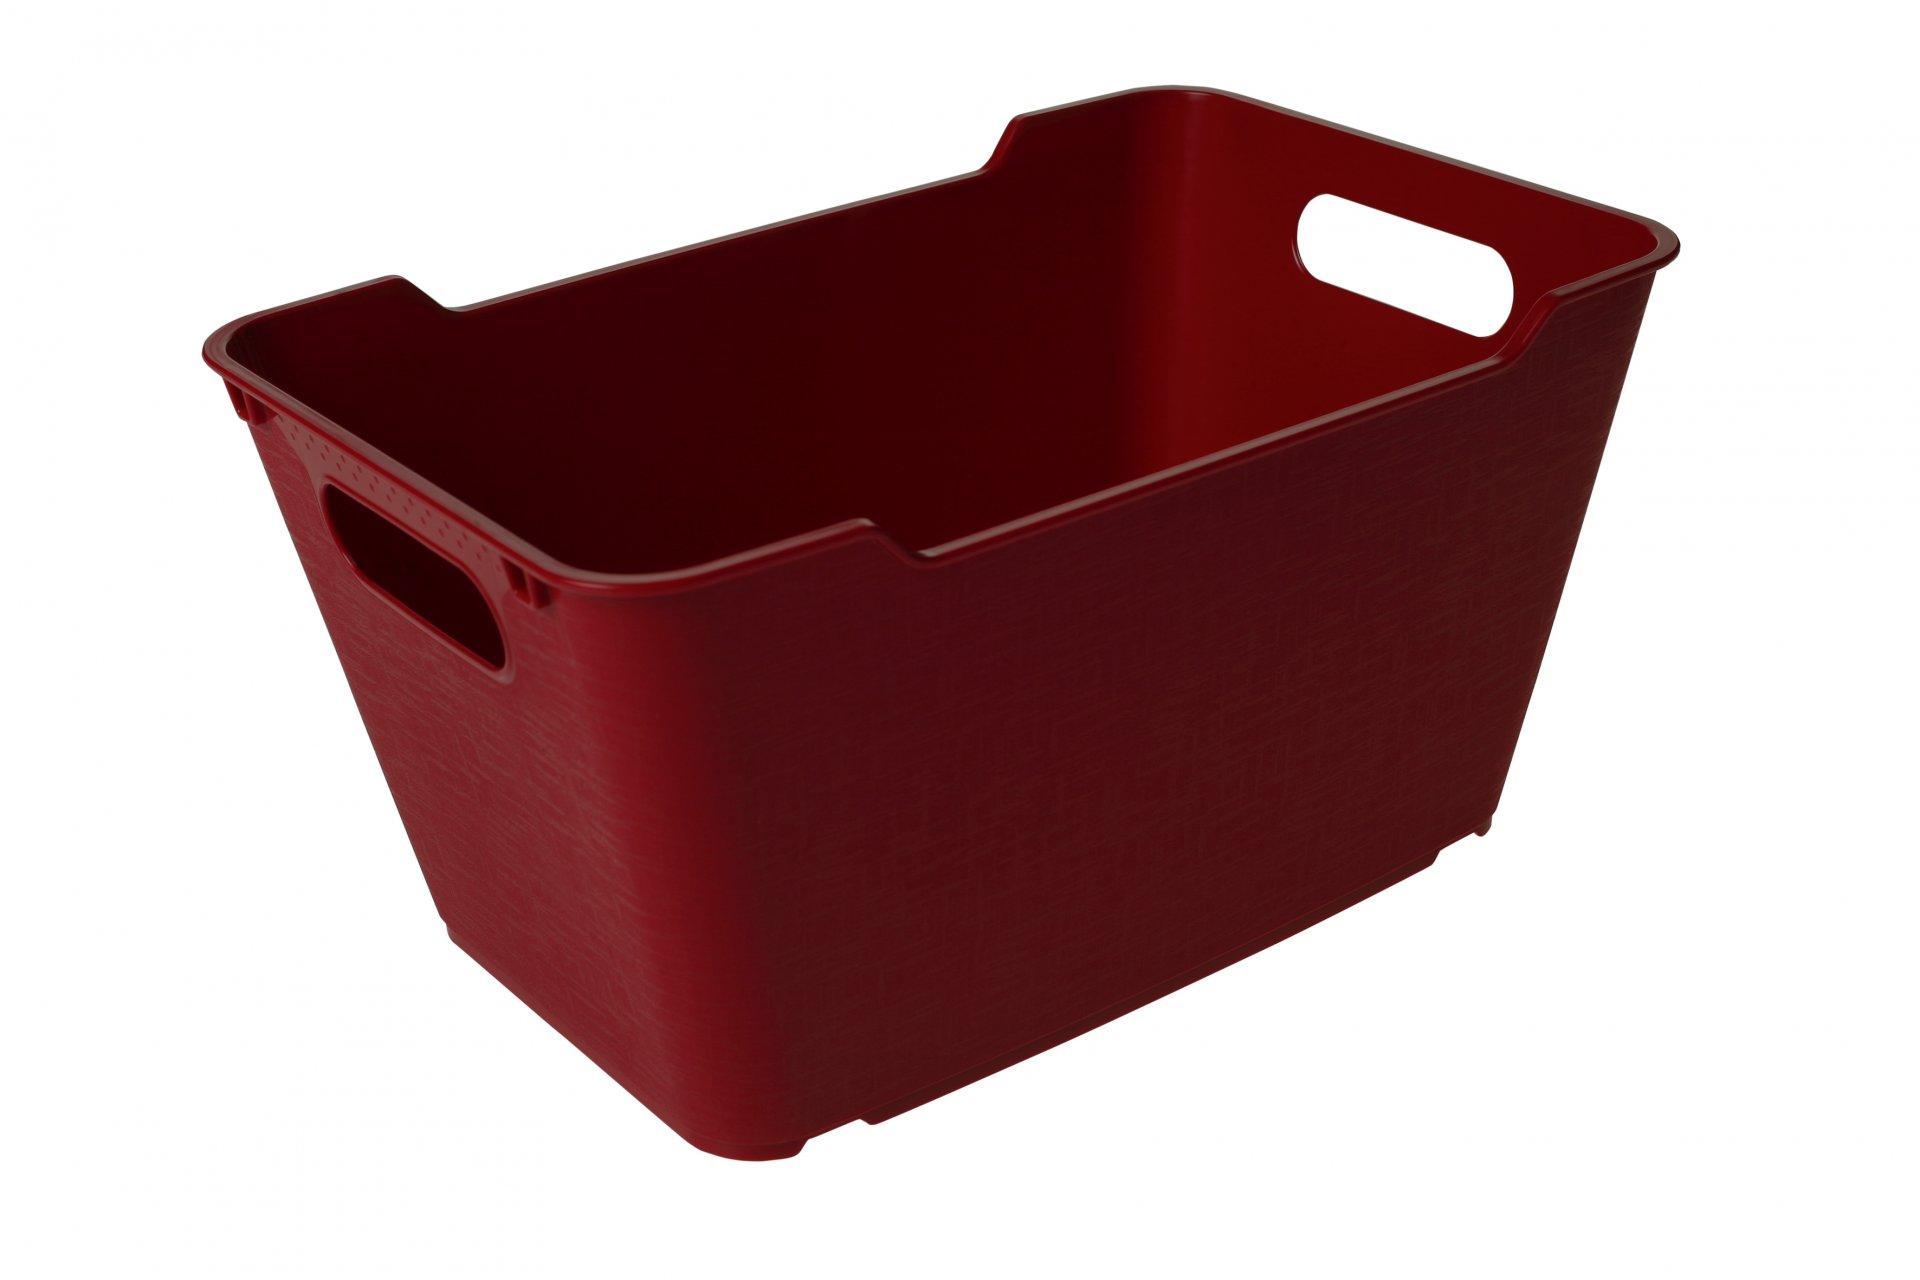 Keeeper Stylový box lotta, červený 6L